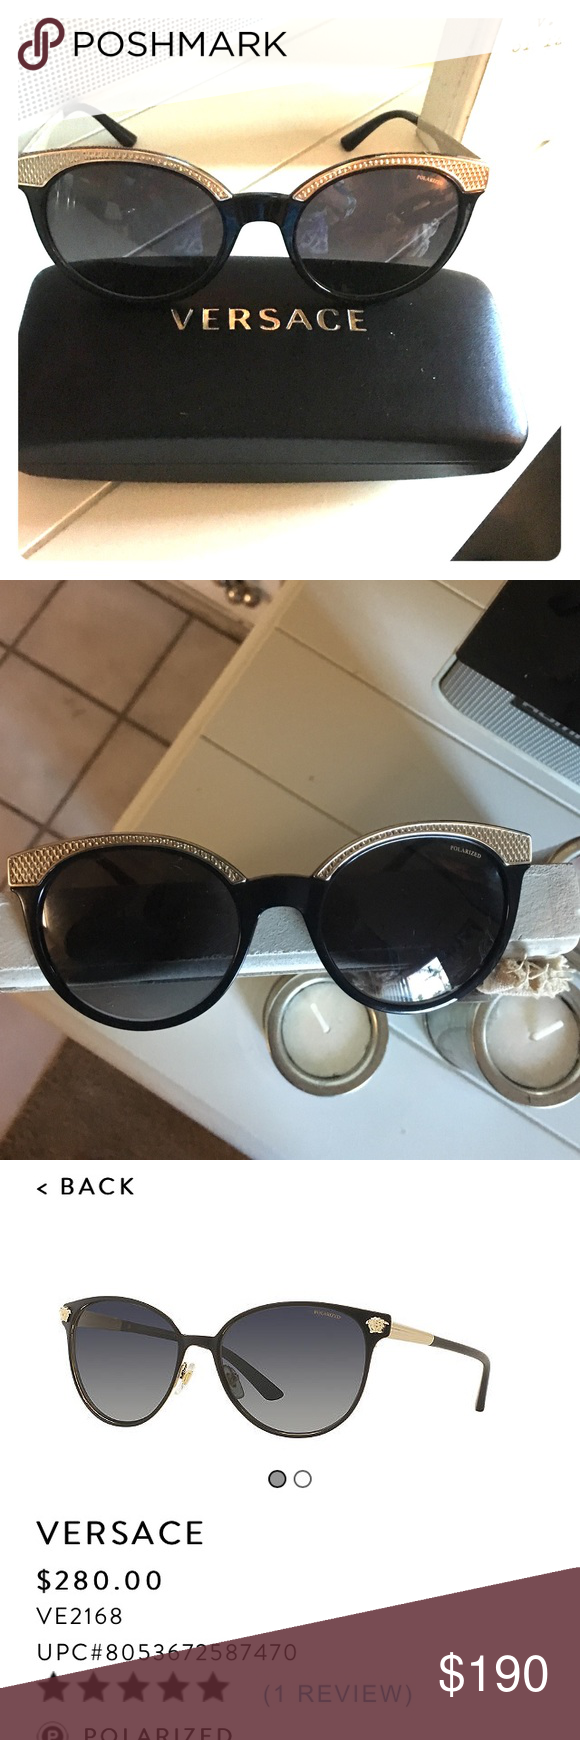 c6dc59753c Authentic NWT Versace Polarized Sunglasses Genuine Versace sunglasses from SUNGLASS  HUT